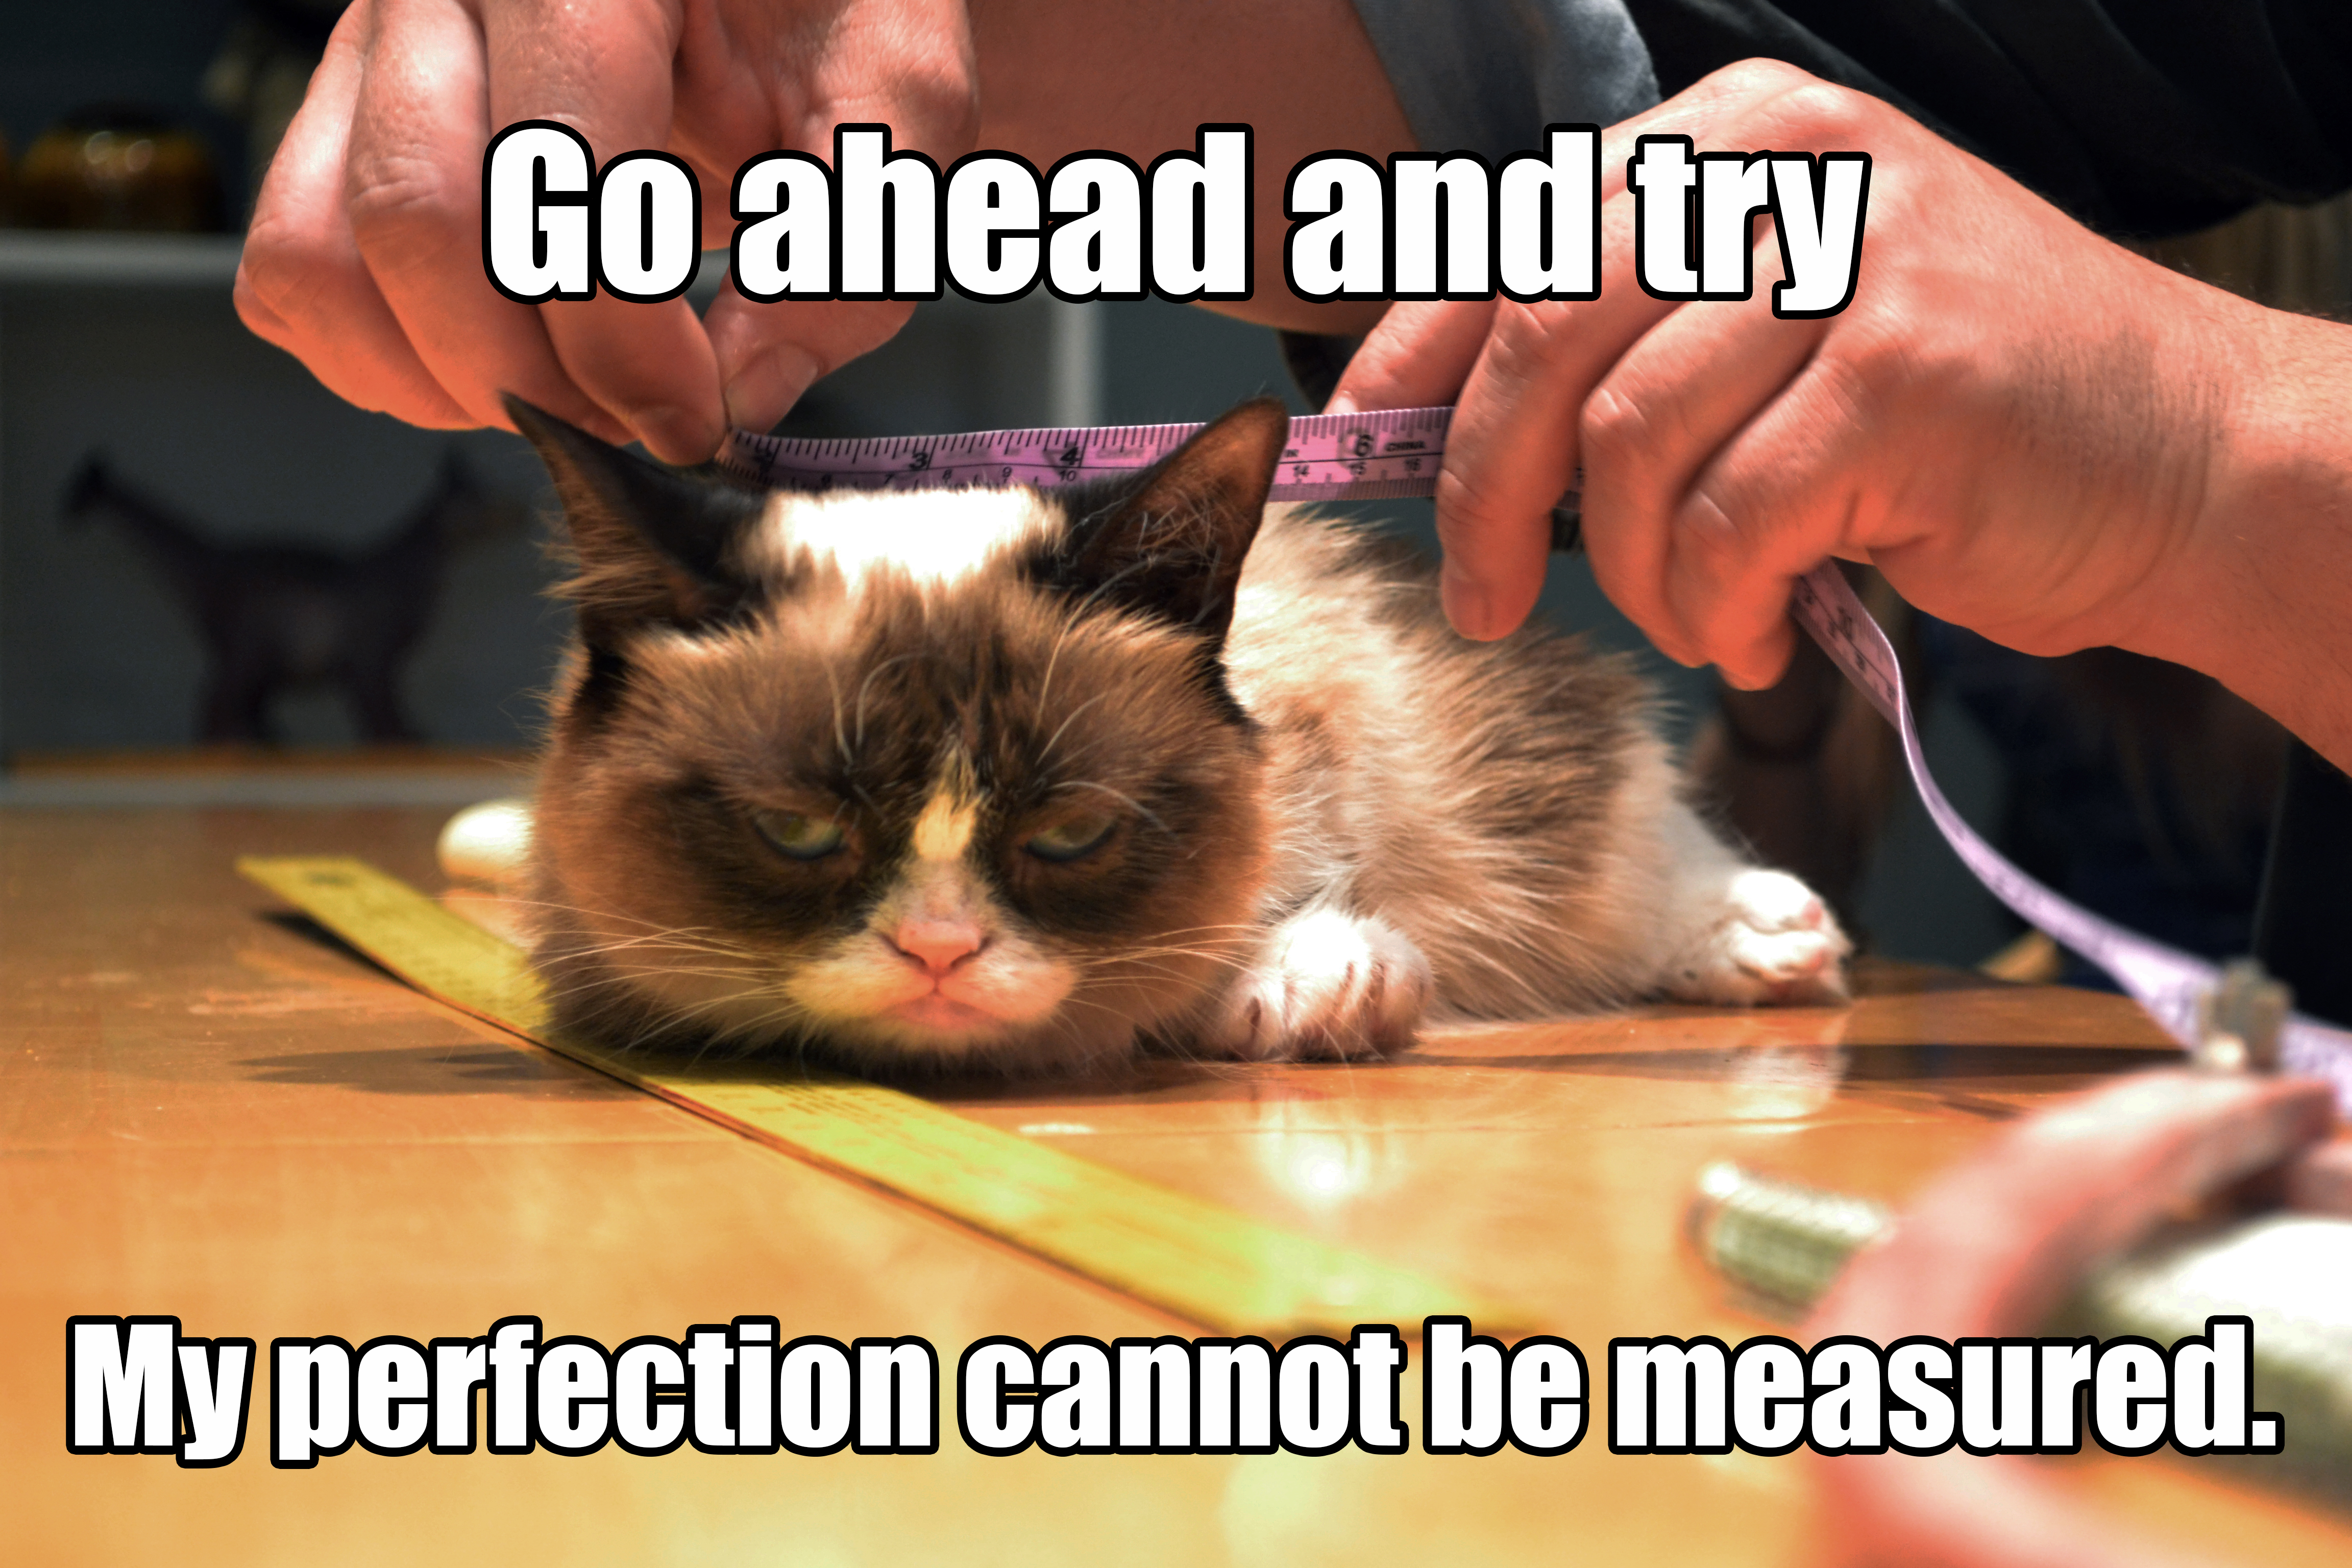 Grump Cat Meme from Jim Henson's Creature Shop